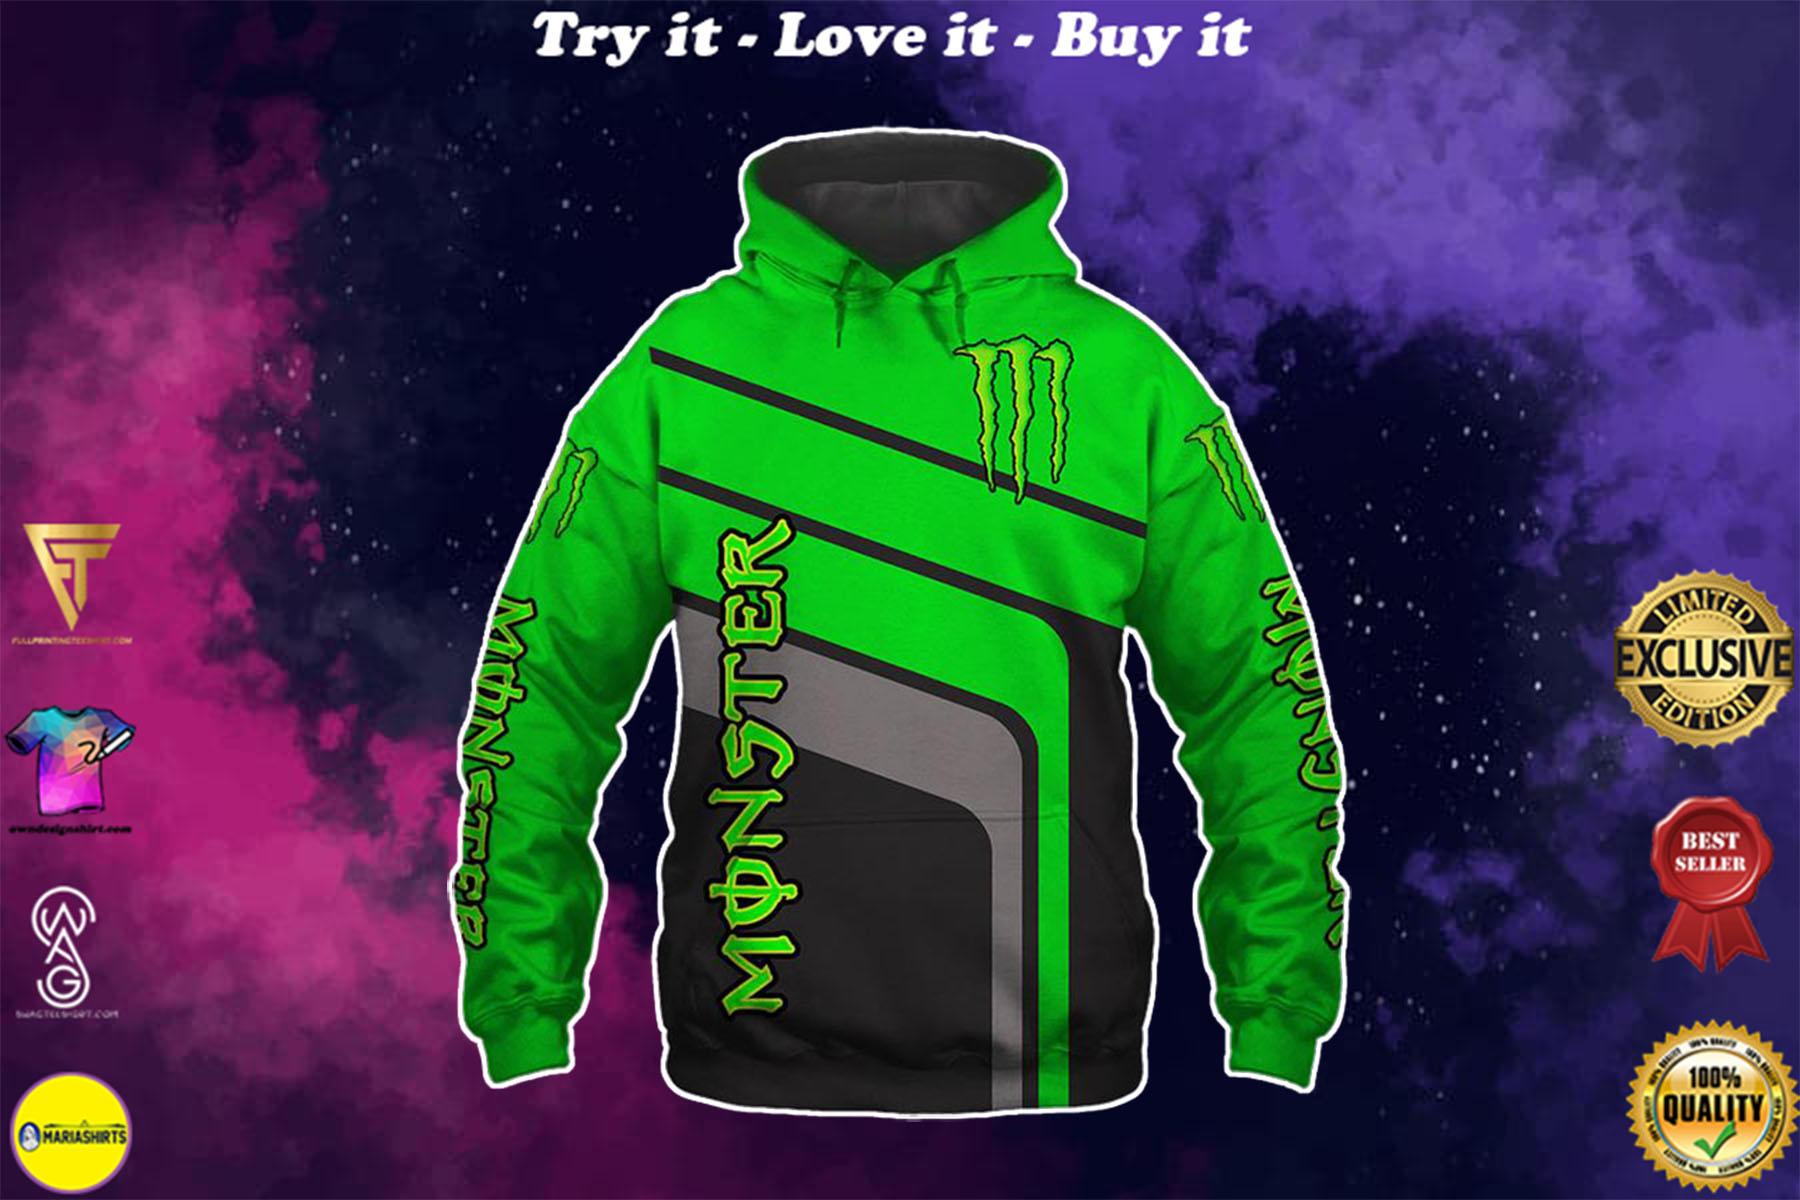 [highest selling] monster energy factory racing motorcross full printing shirt - maria